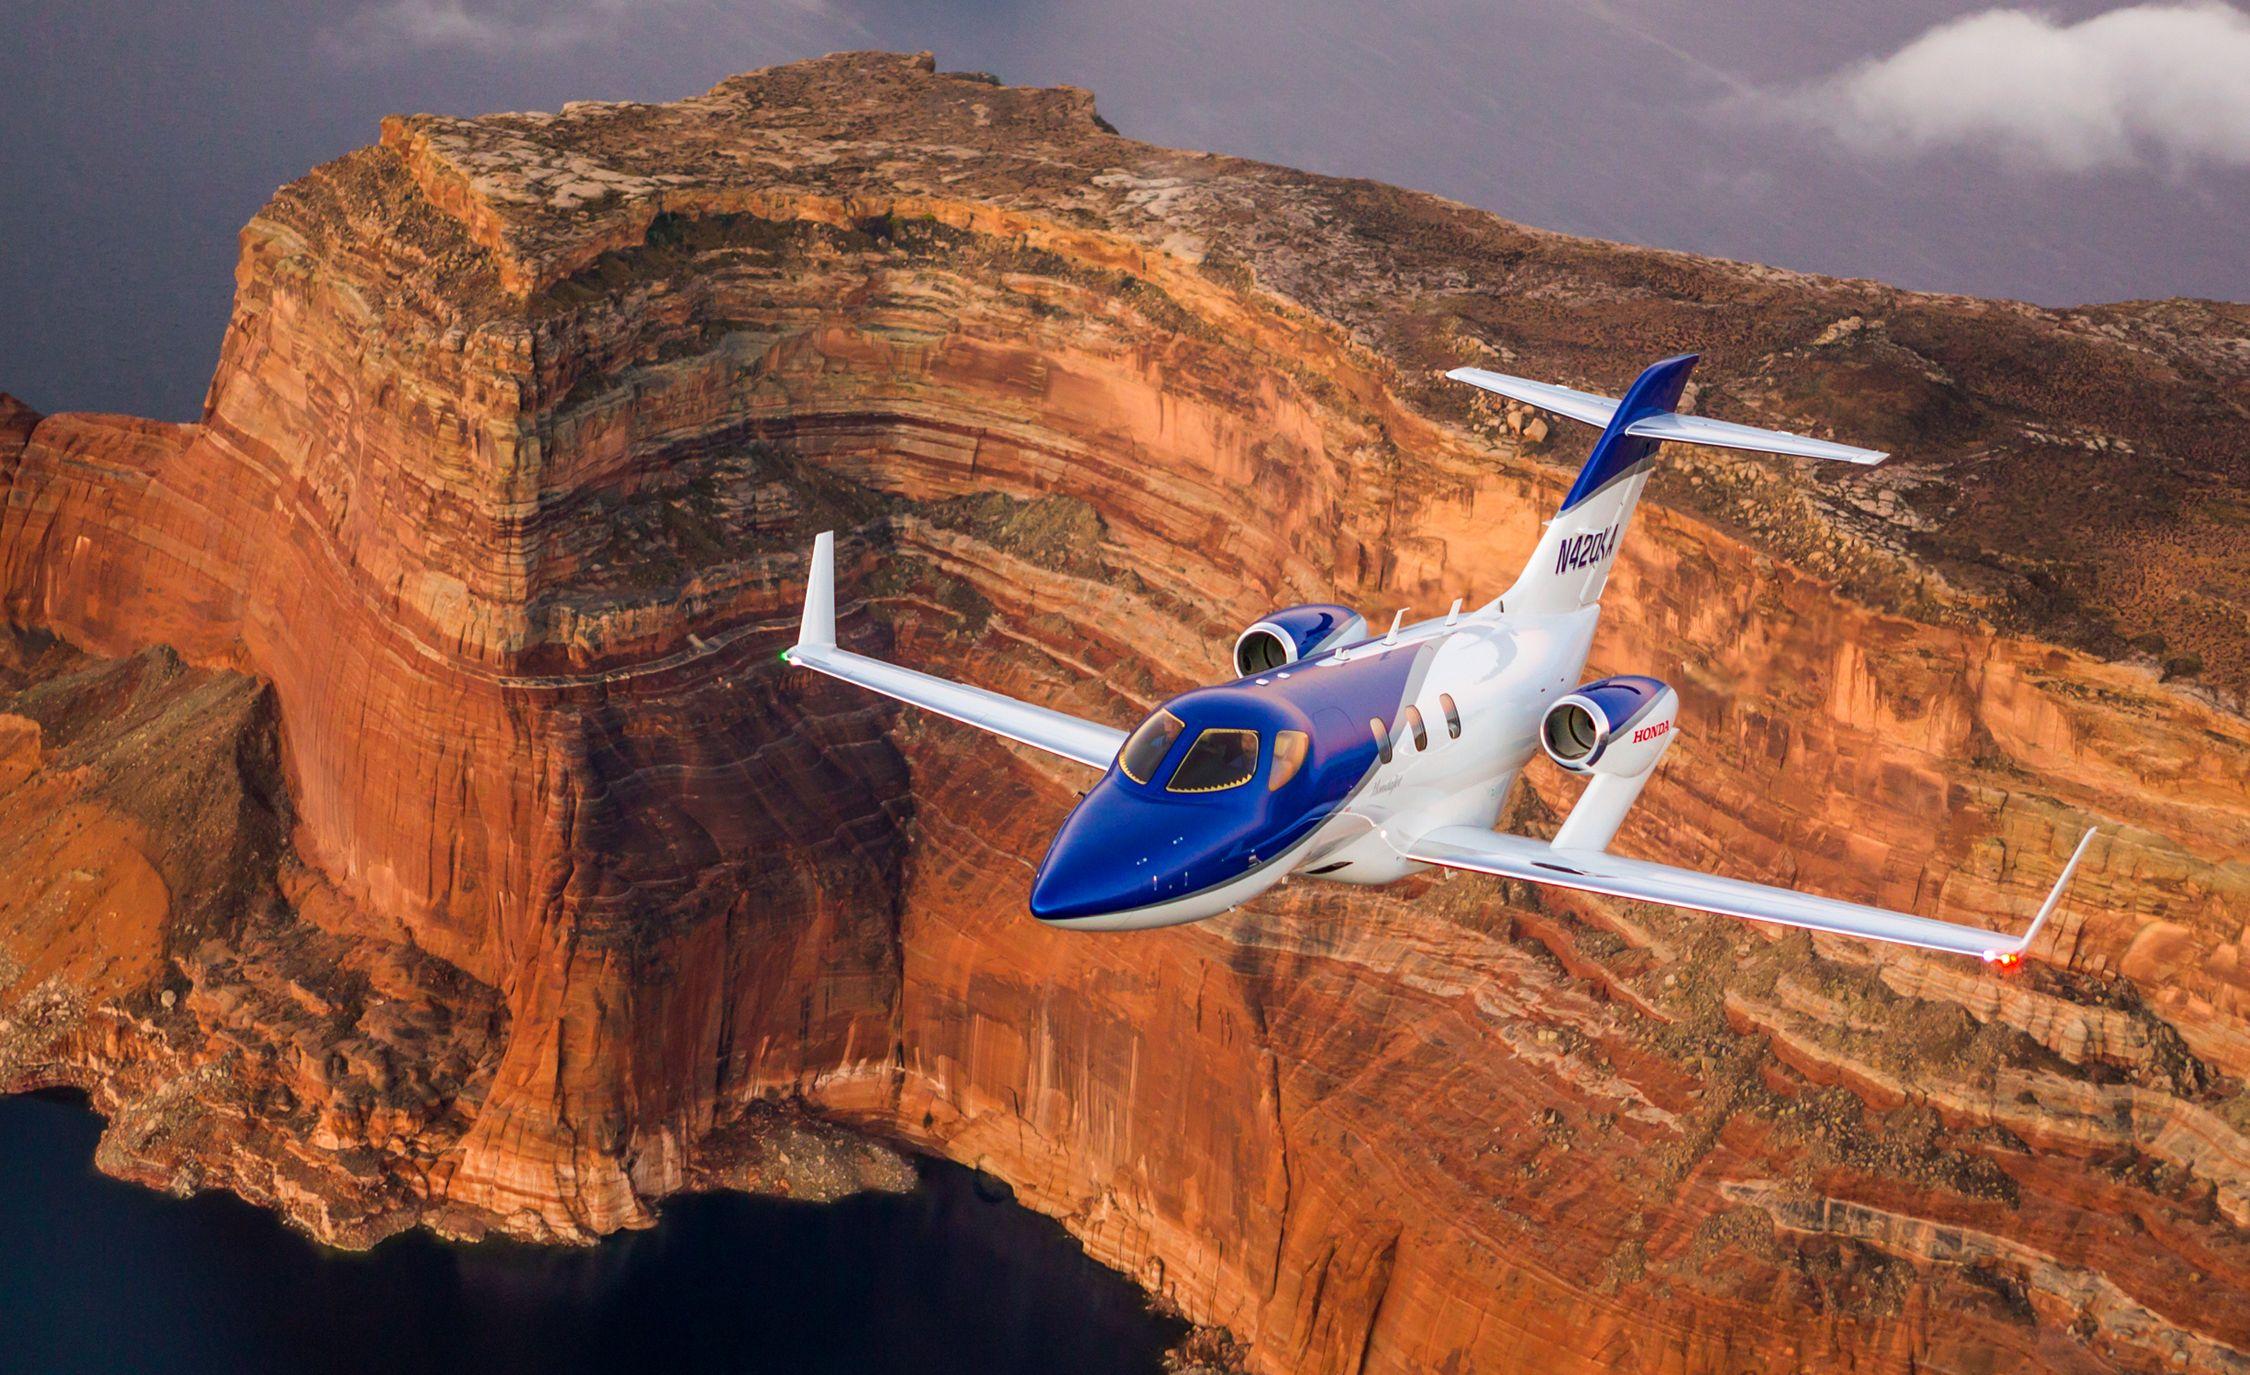 HondaJet HA 420 First Flight Review Car And Driver